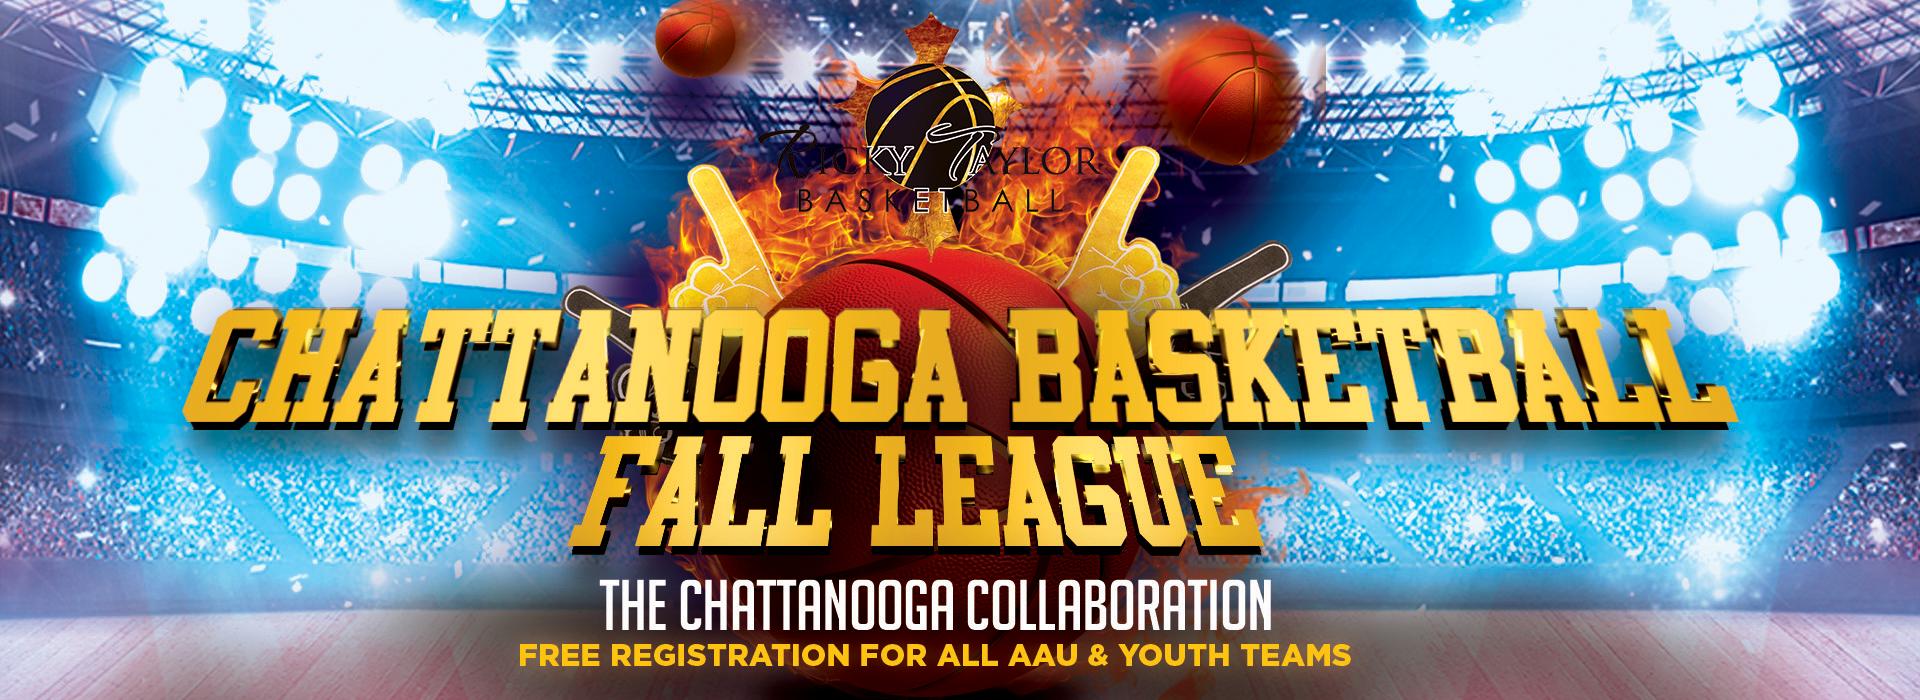 RTB_Chattanooga_Fall_League_Banner